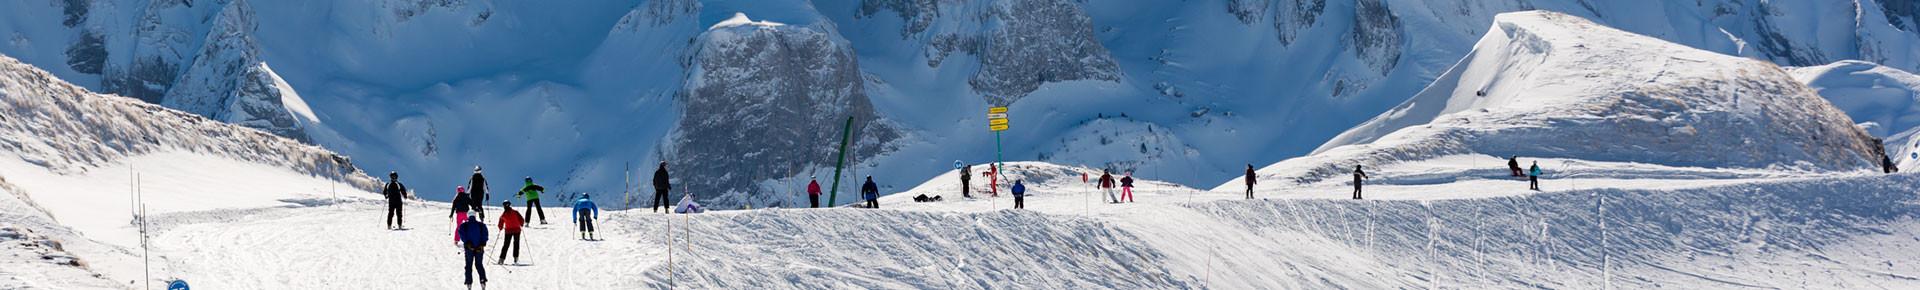 Skier en Vallée d'Aulps